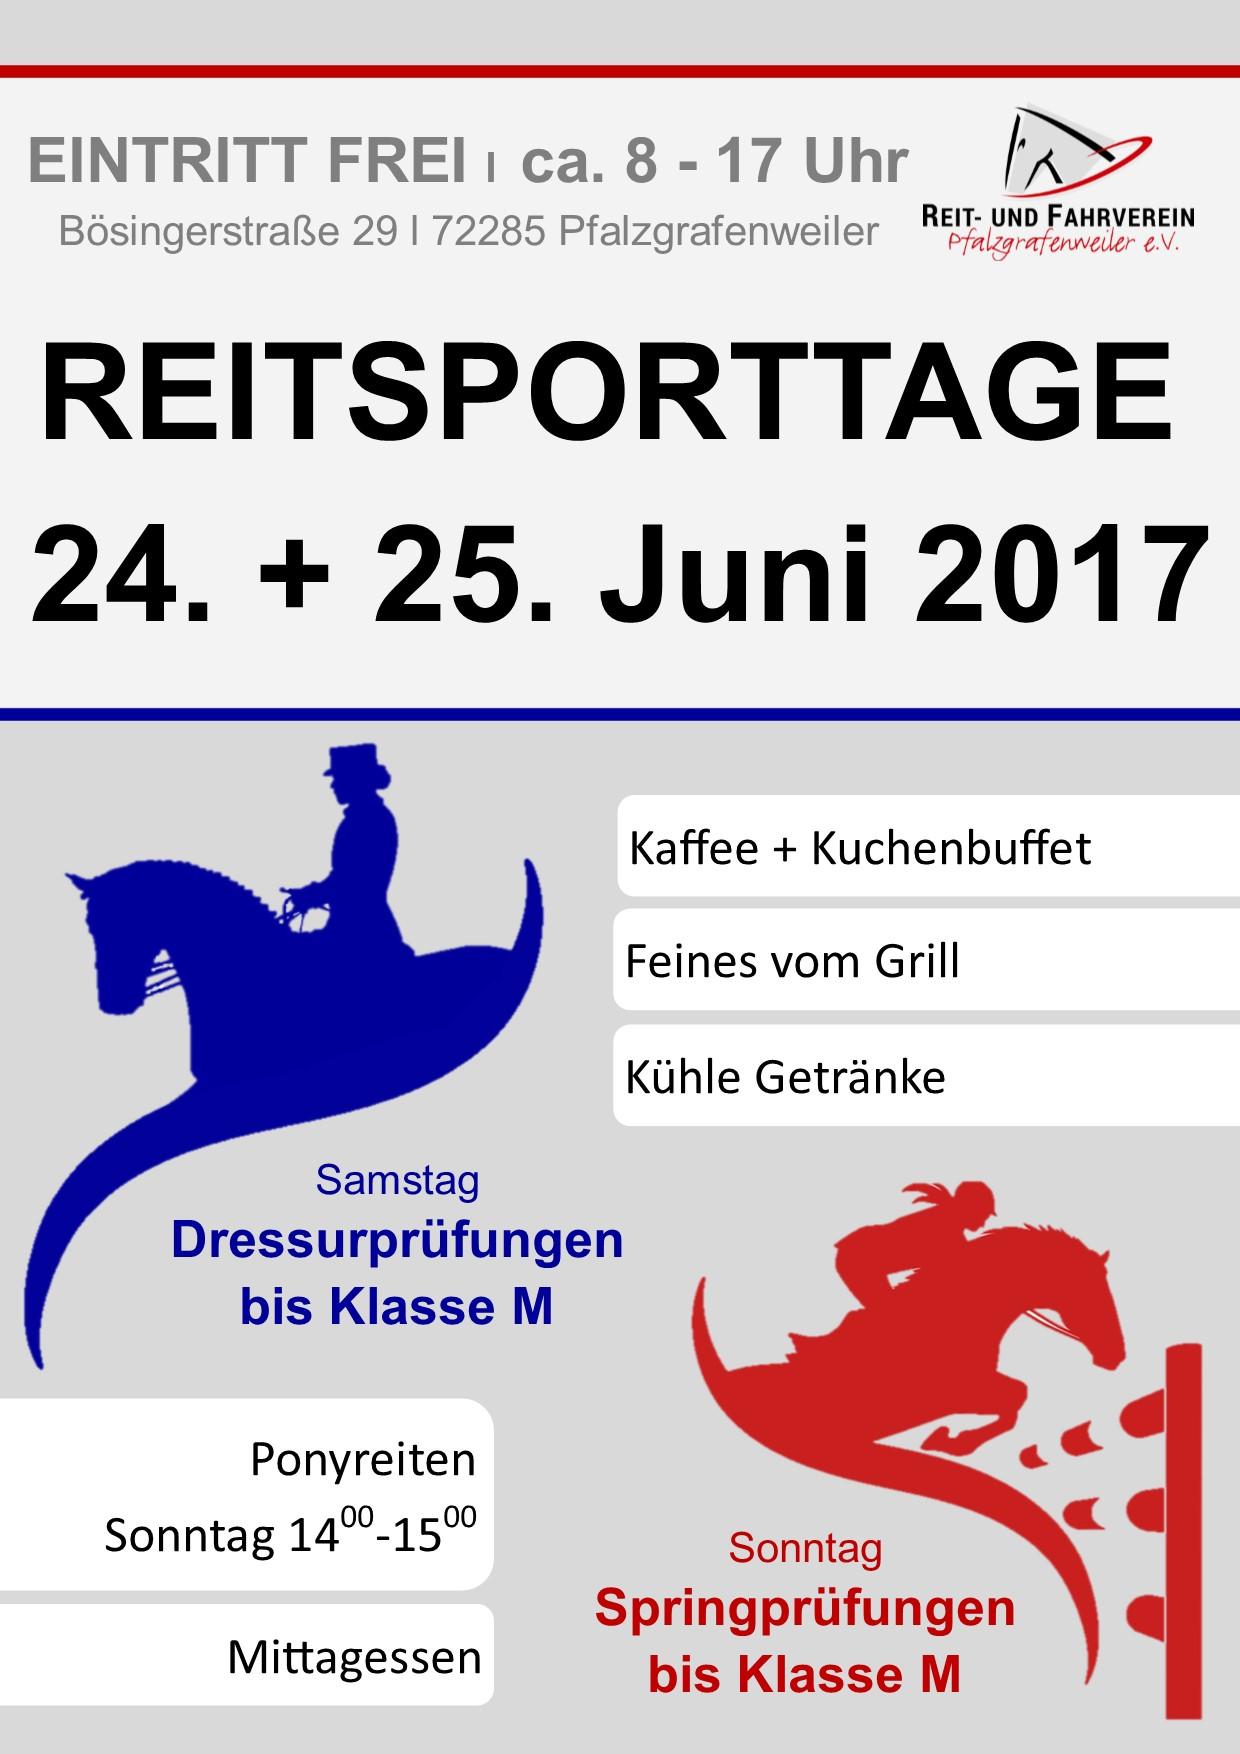 Reitsporttage 2017